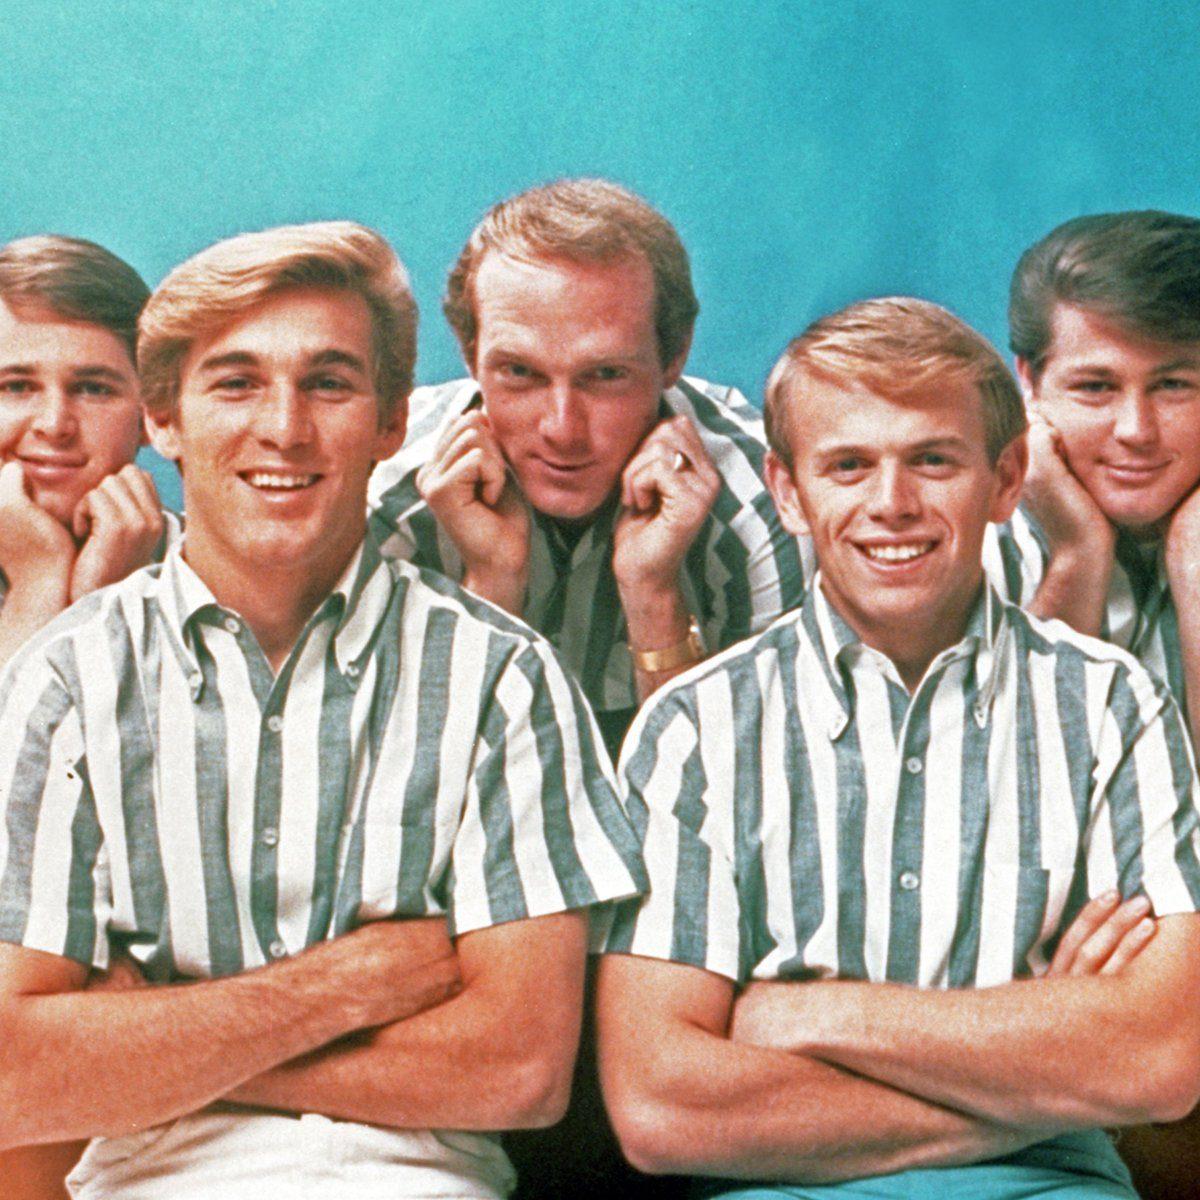 Mandatory Credit: Photo by Globe Photos/Mediapunch/Shutterstock (10191737a) The Beach Boys The Beach Boys